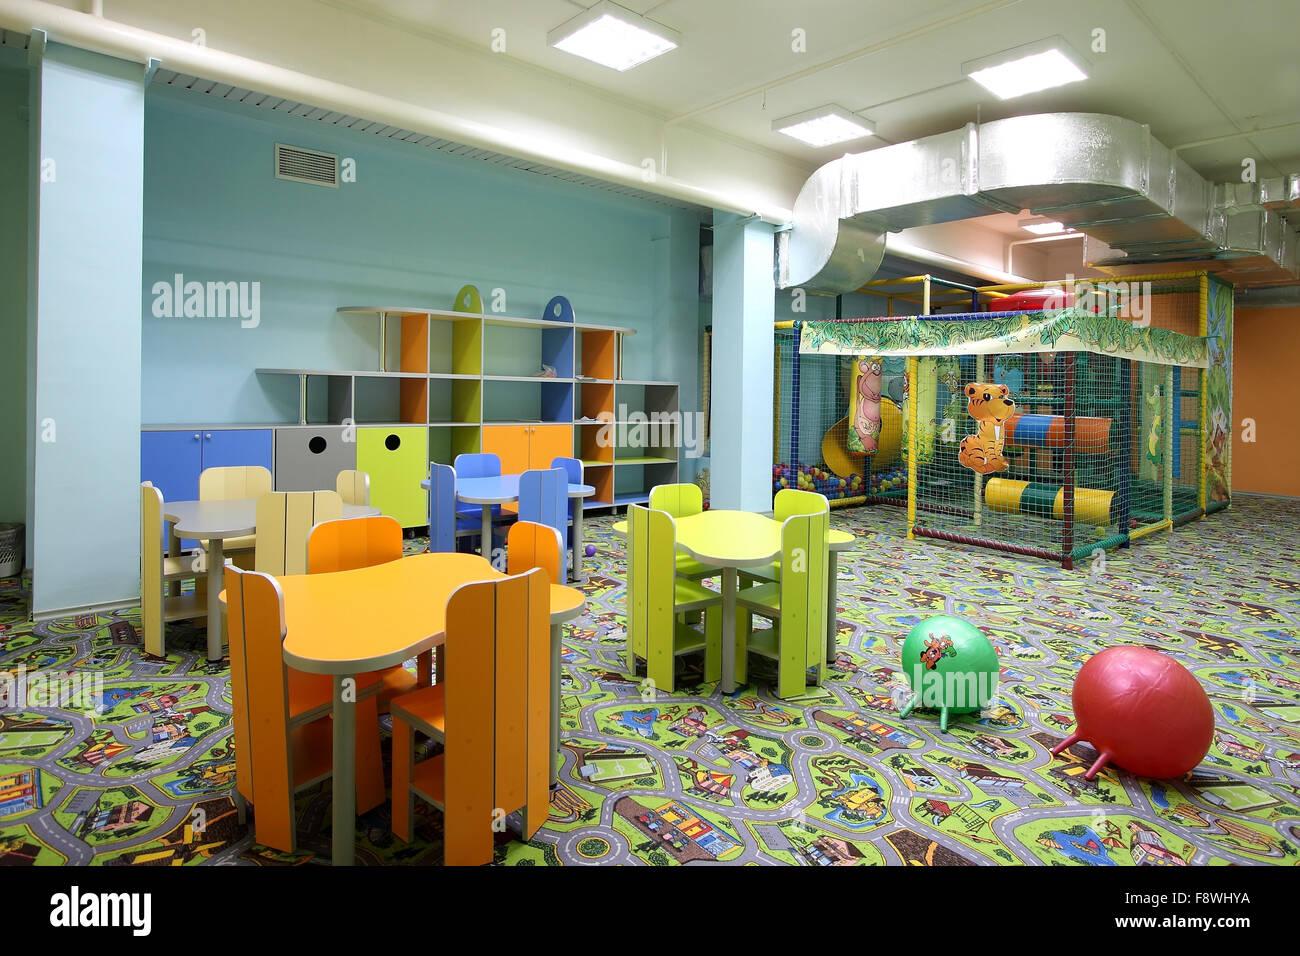 children's room Stock Photo